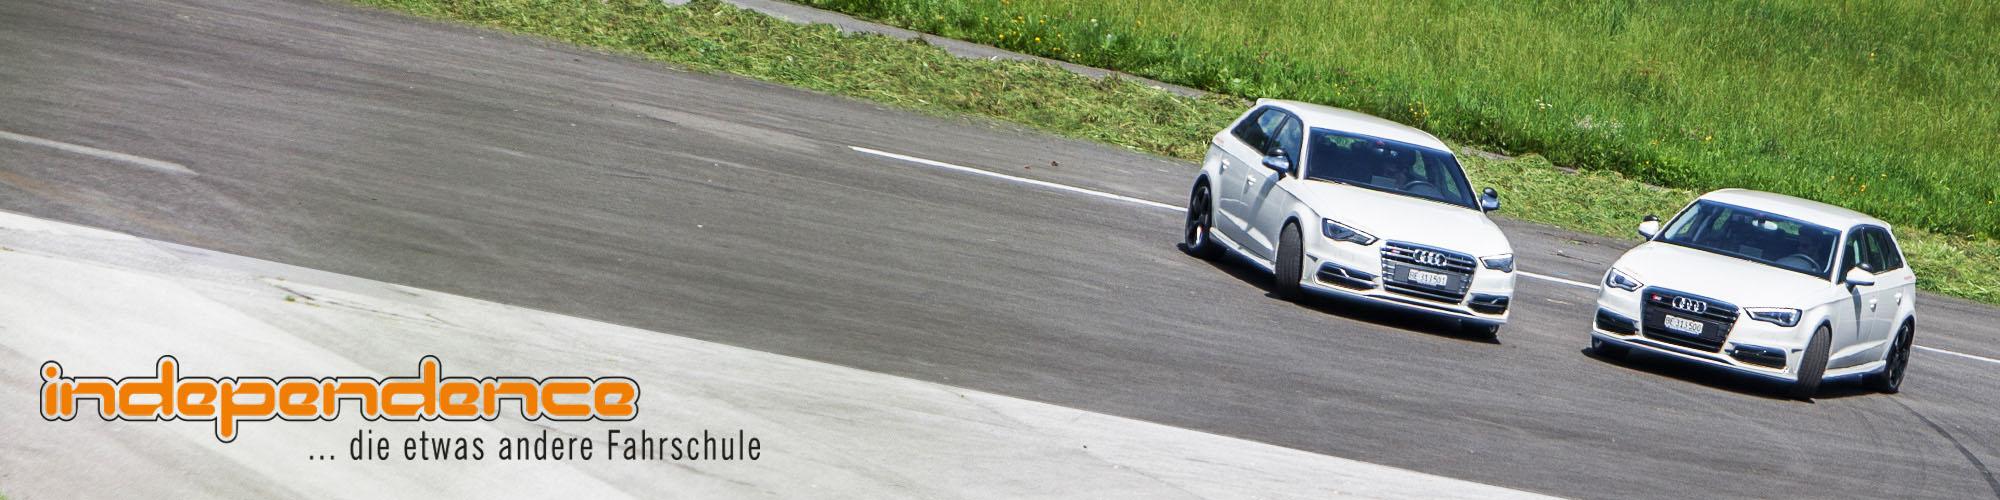 Bilder independence-drive GmbH